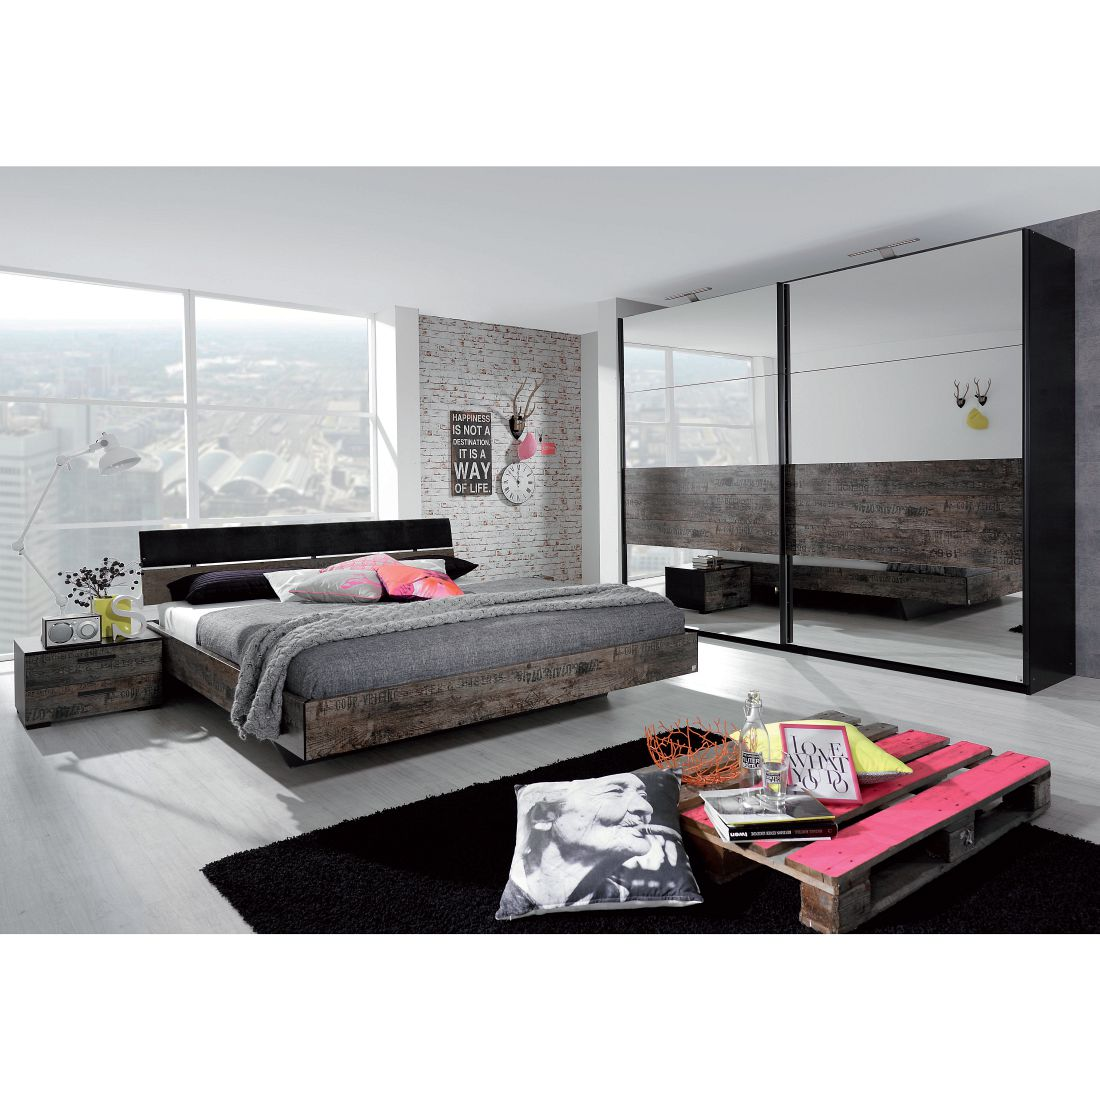 Schlafzimmerset Sumatra II (4teilig) - Vintage Braun - Liegefläche Bett: 140 x 200cm, Rauch Select